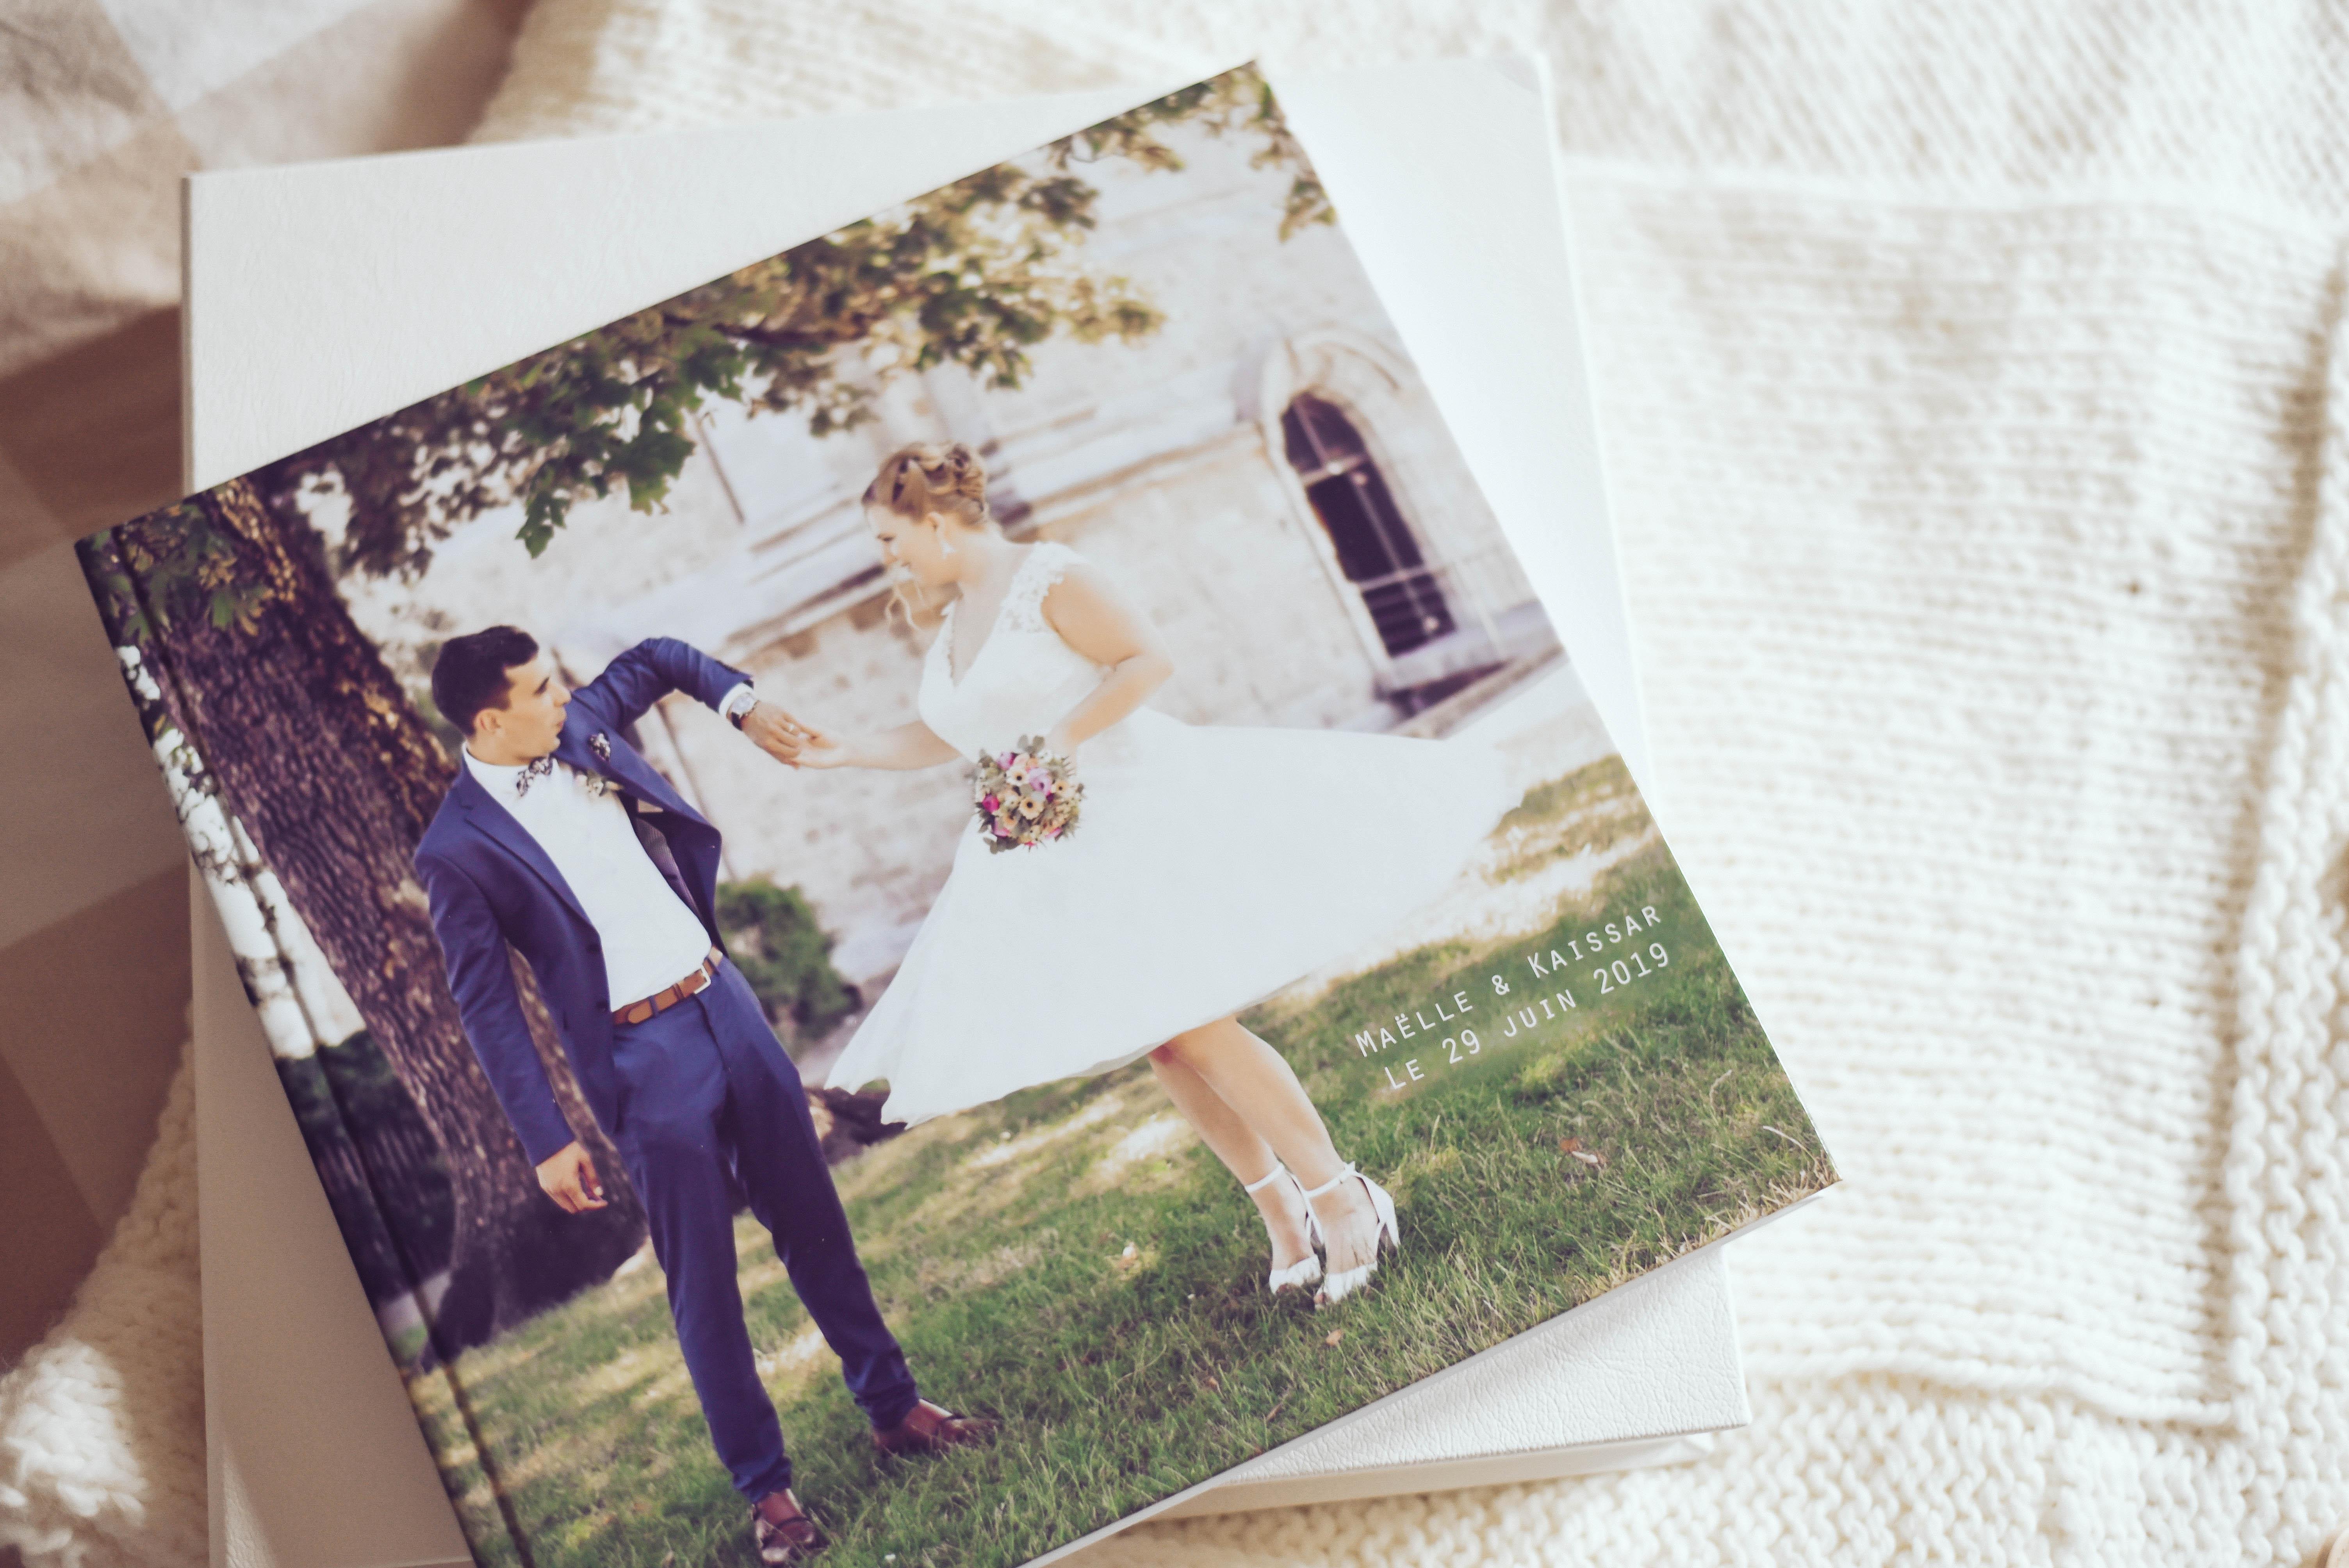 Le mariage de Maëlle & Kaissar